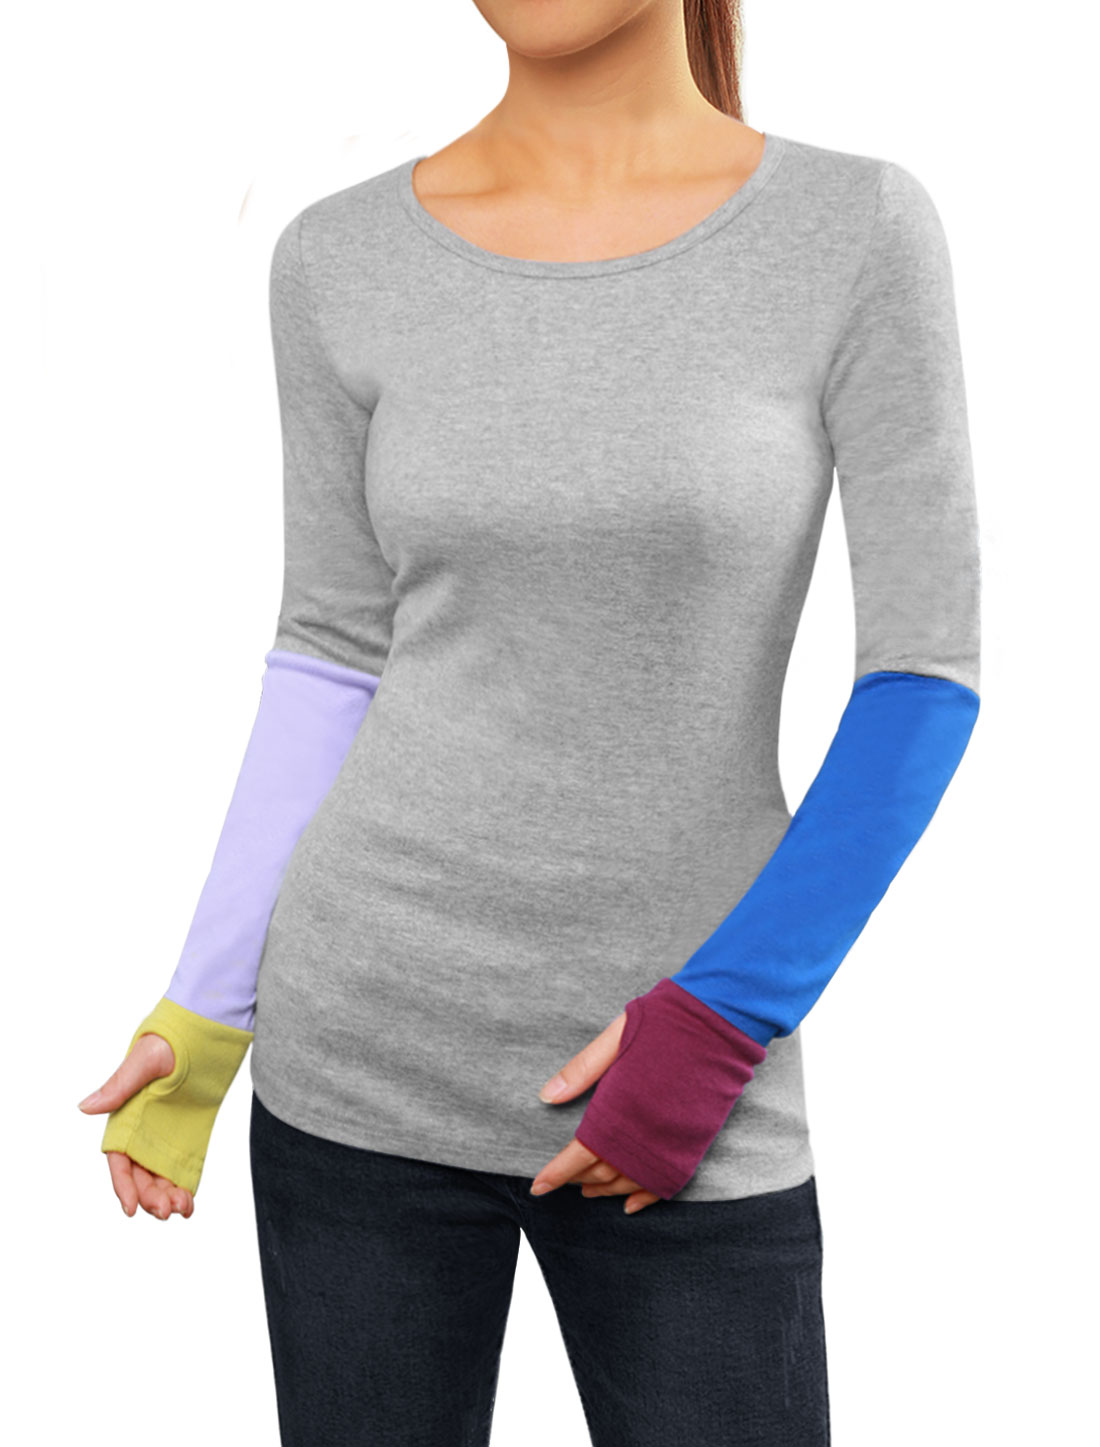 Allegra K Woman Color Block Long Sleeves T-Shirt w Thumb Hole Gray S